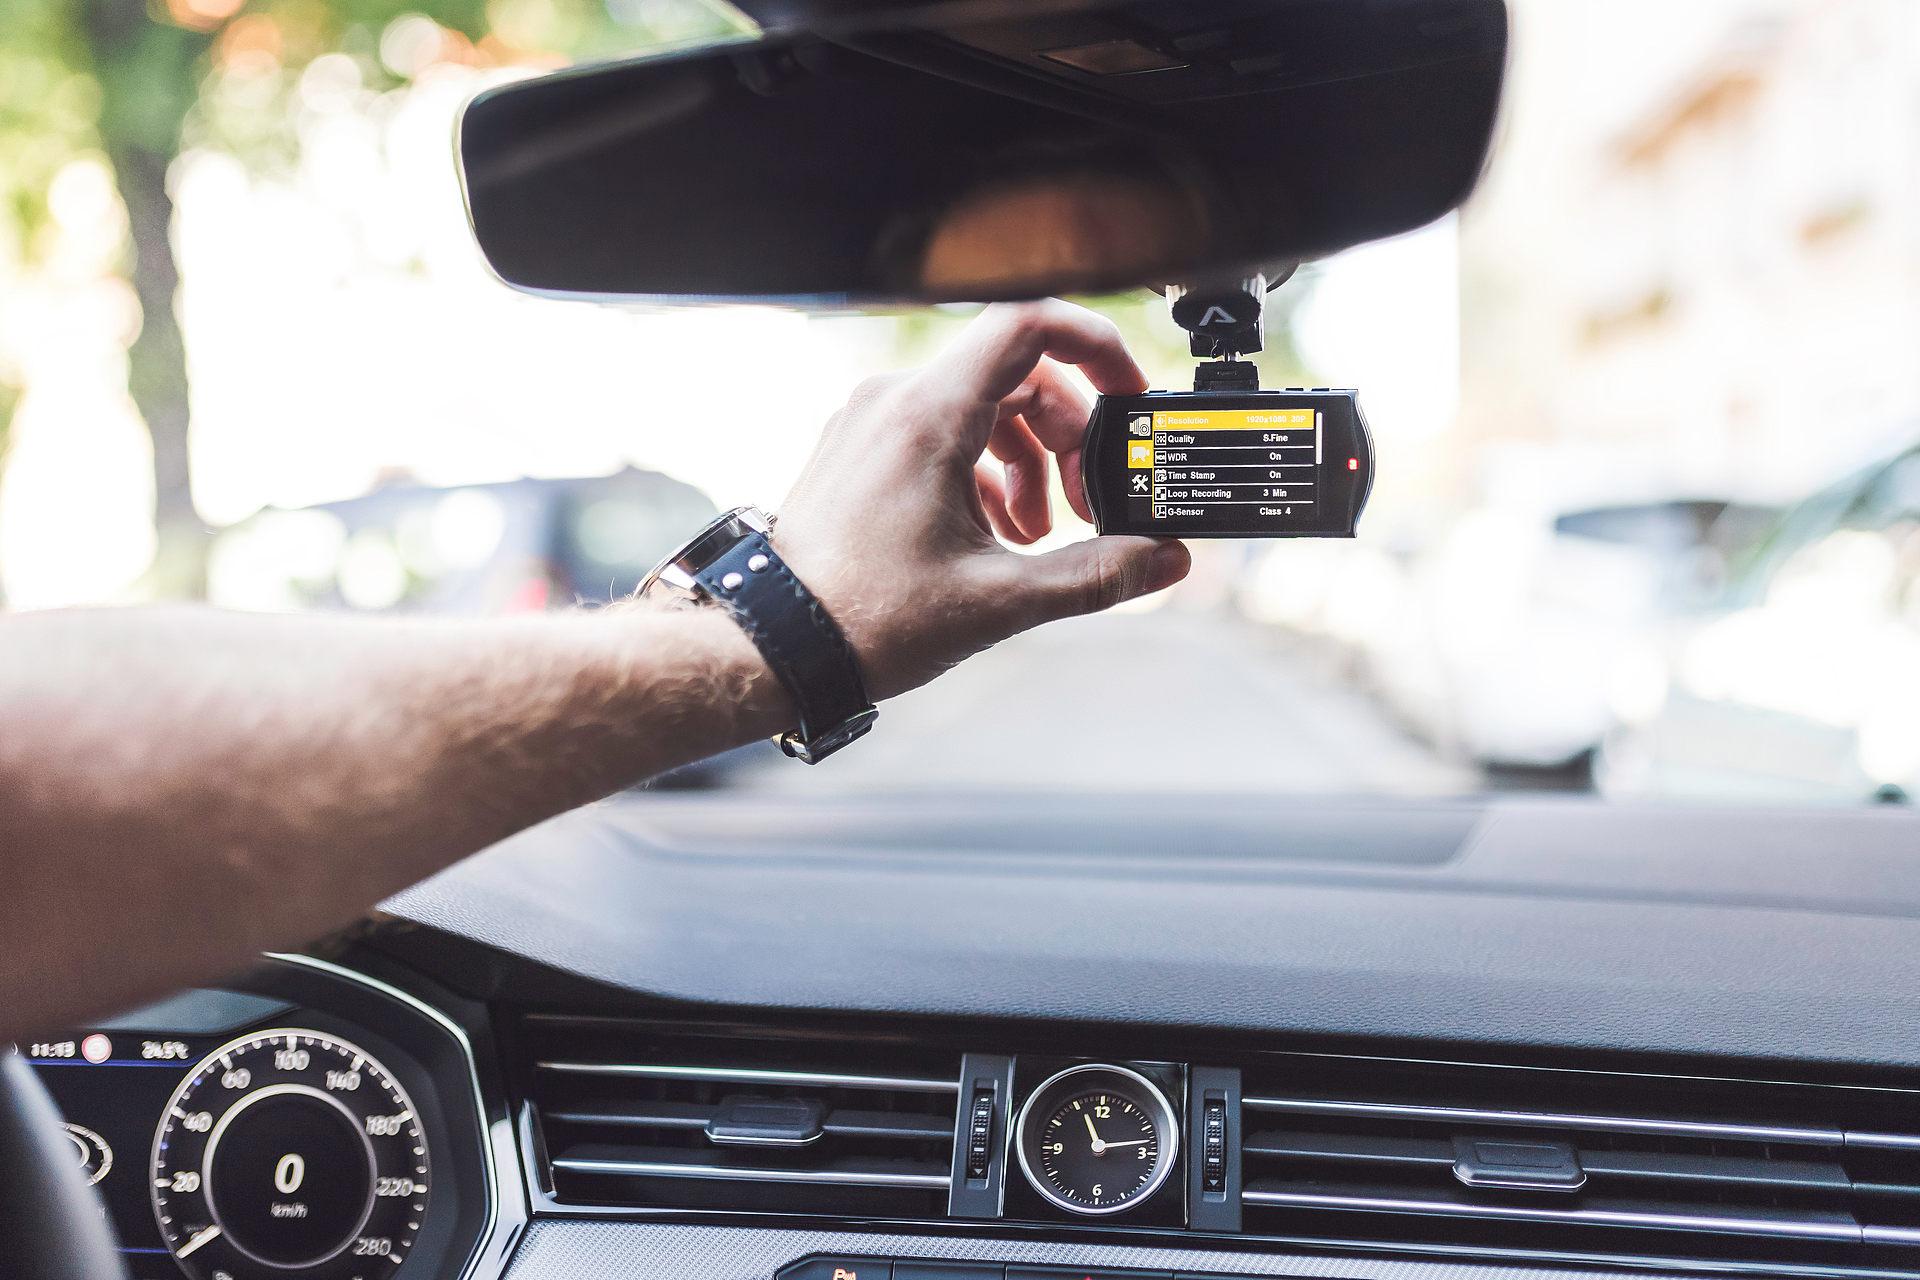 دوربین کوچک خودرو | دوربین مخفی کوچک خودرو | دوربین مخفی خودرو